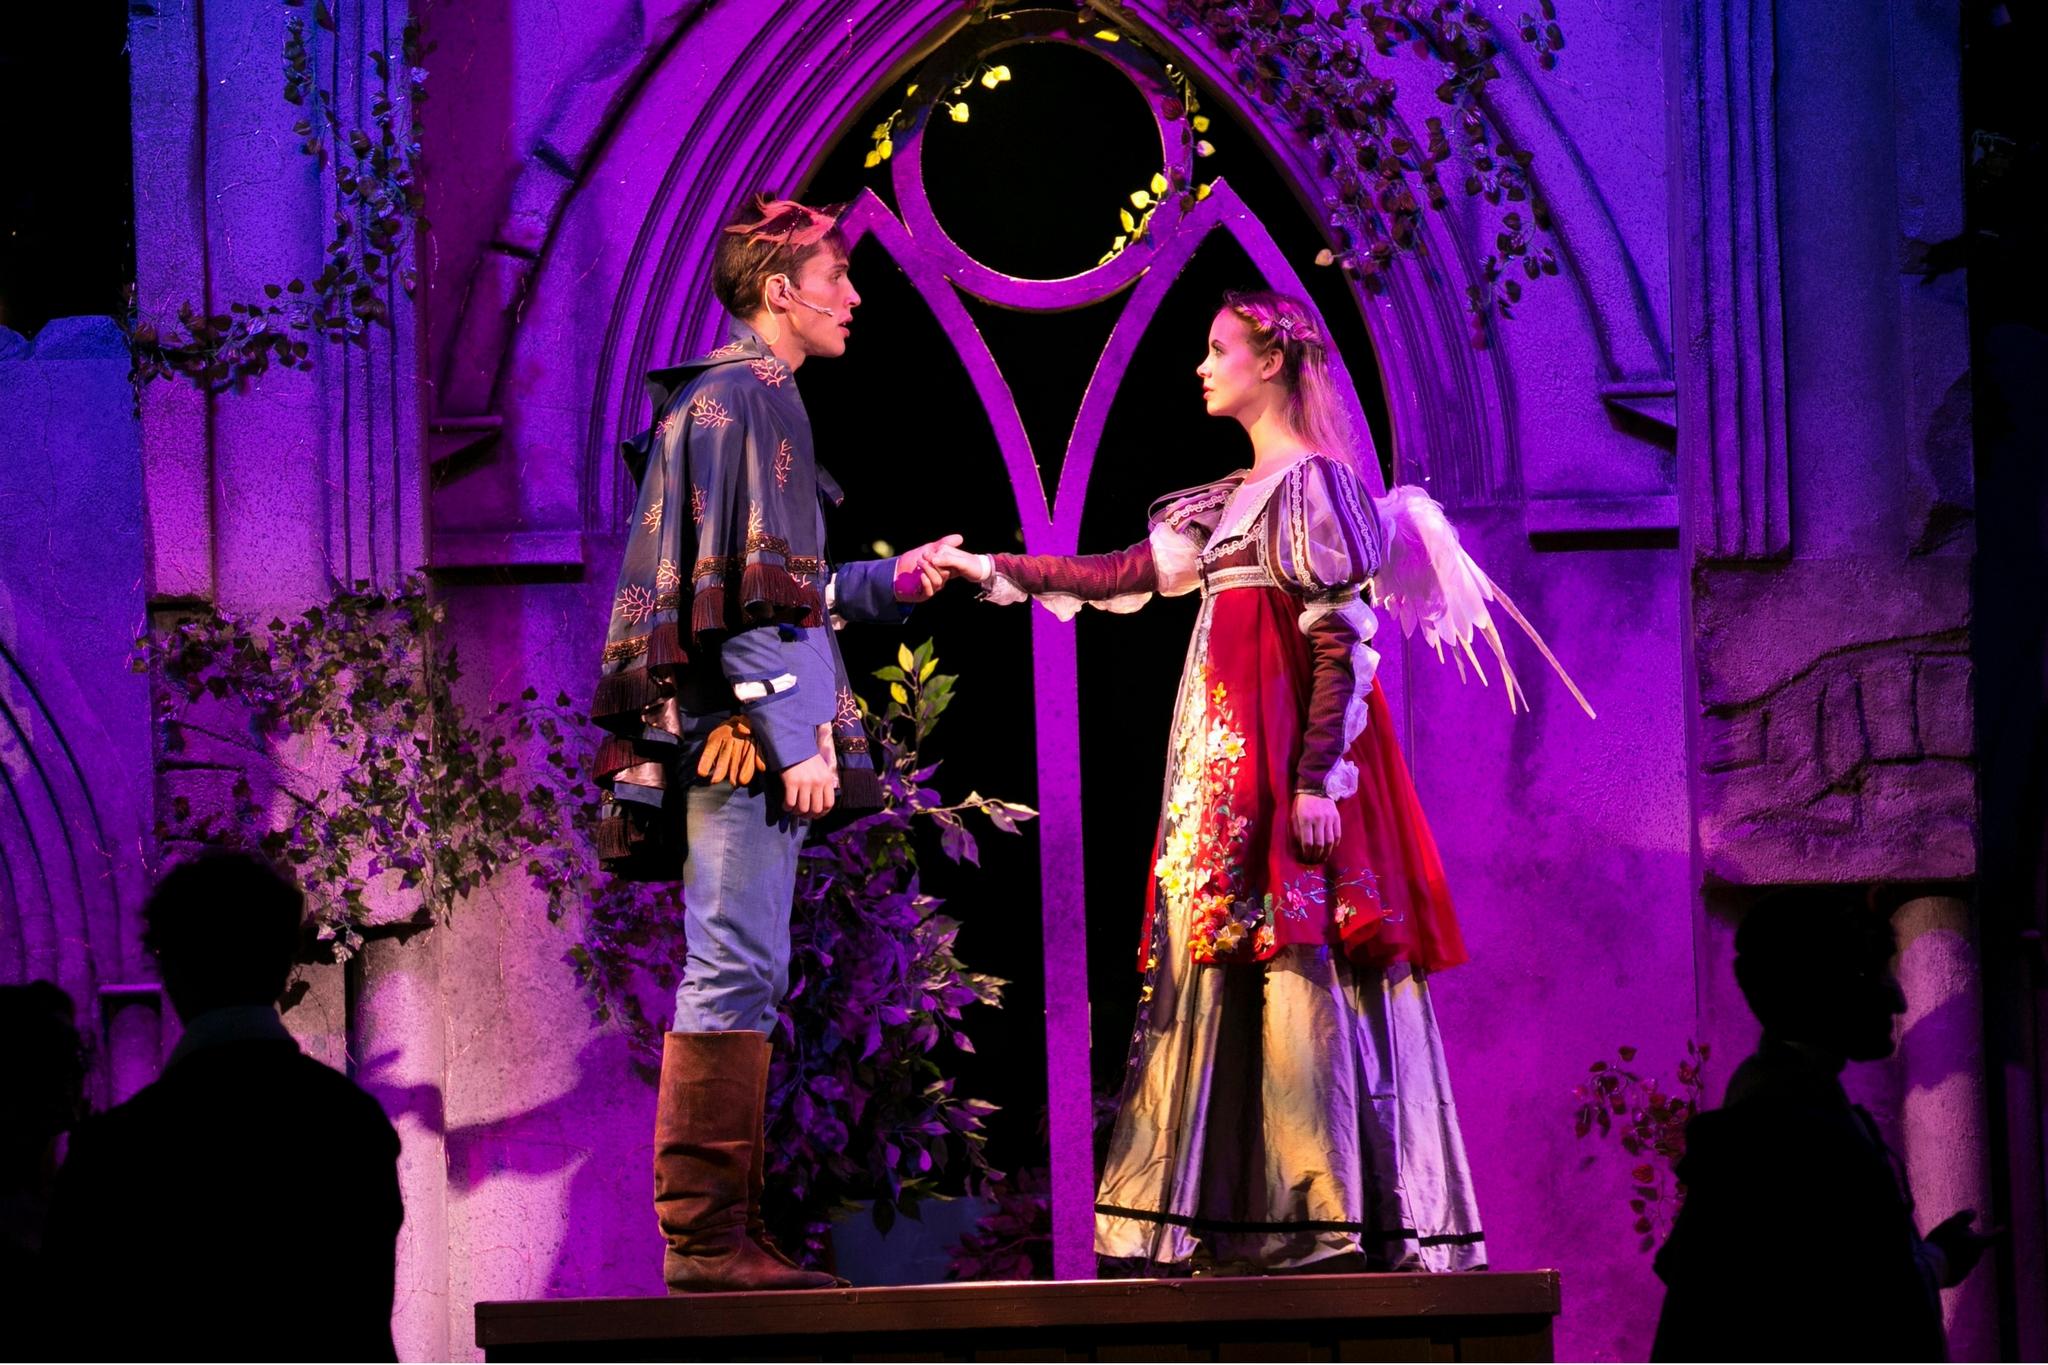 John Zdrojeski (Romeo) and Gracyn Mix (Juliet) in Romeo & Juliet, Shakespeare on the Common 2017-Photo by Evgenia Eliseeva